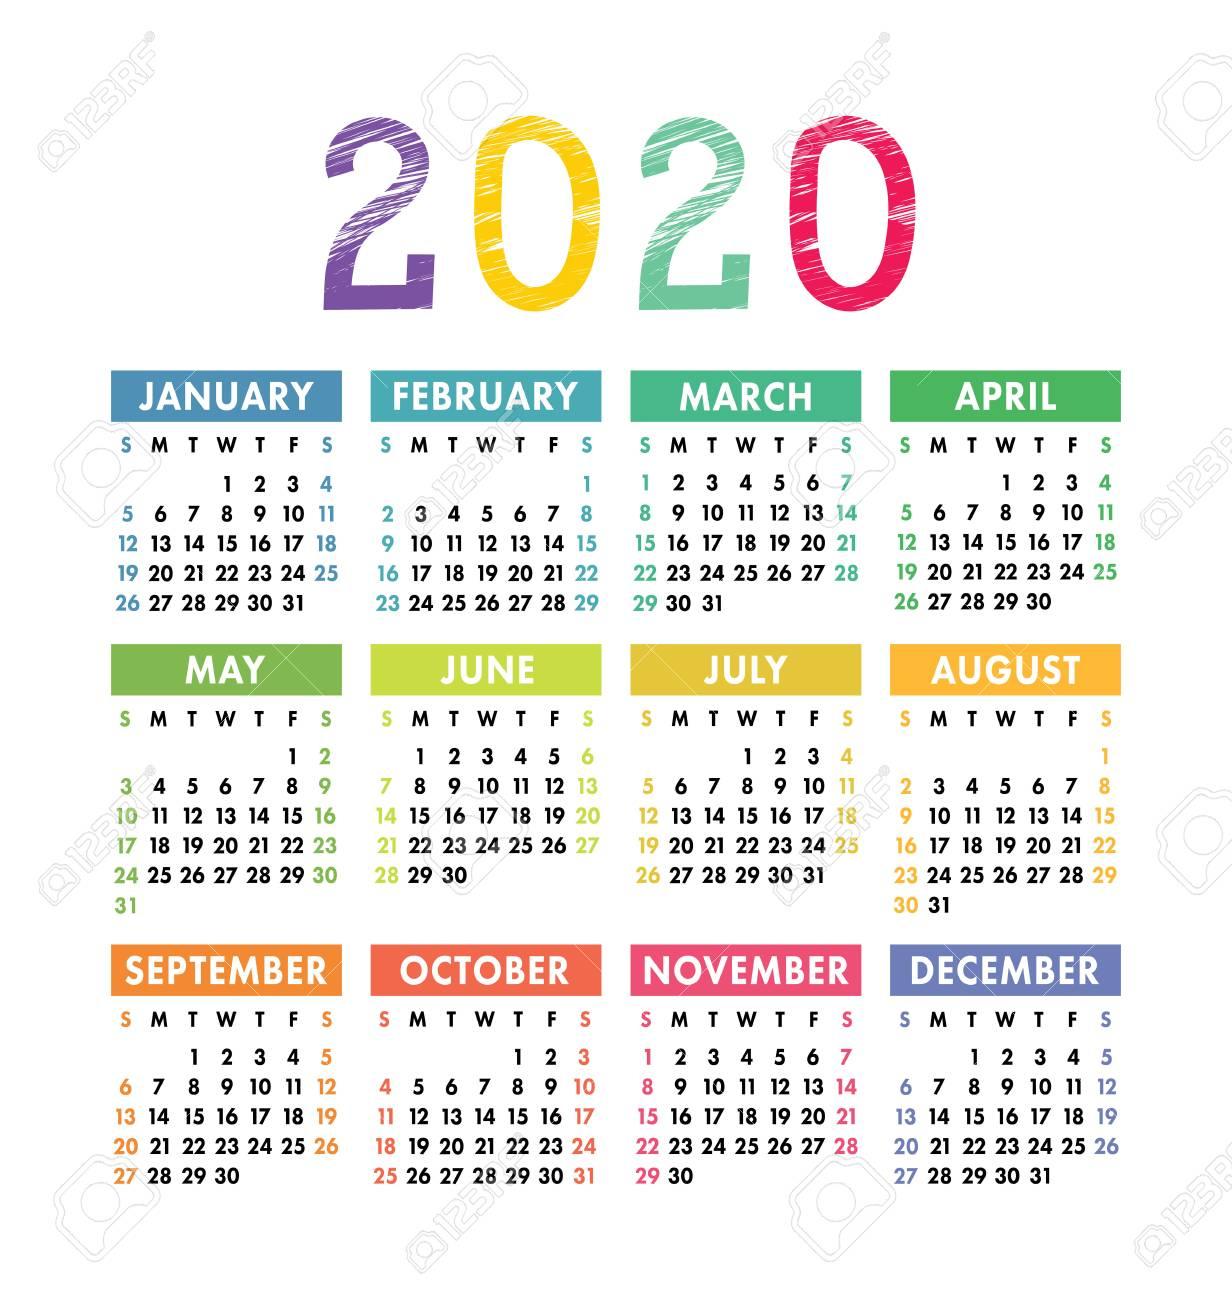 Calendar 2020 – Літопис Упа For Yrdsb Calendar 2020